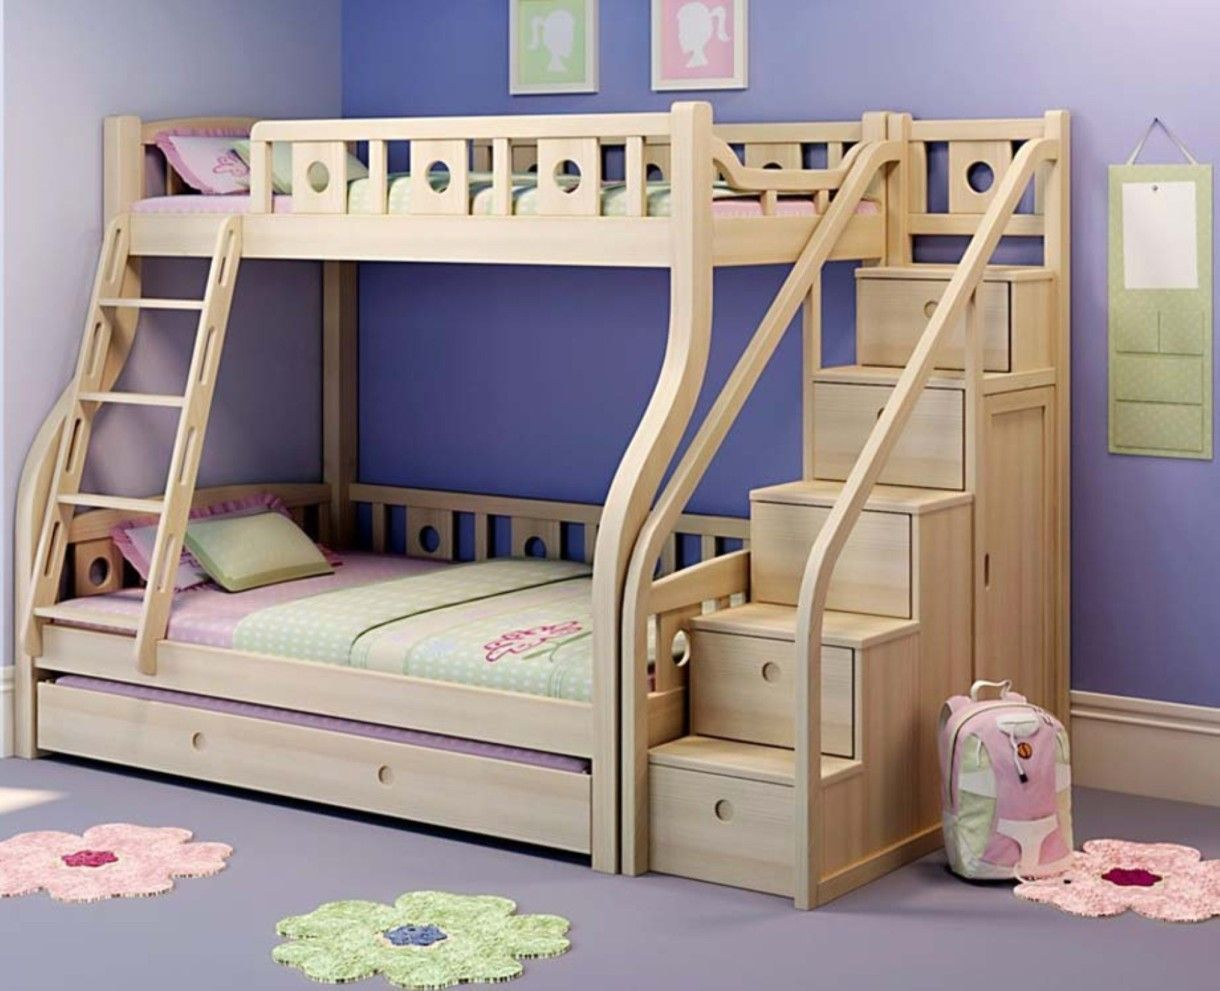 Loft bed ideas for girls  christmas decoration ideas ladder  Google Search  Love It  Pinterest